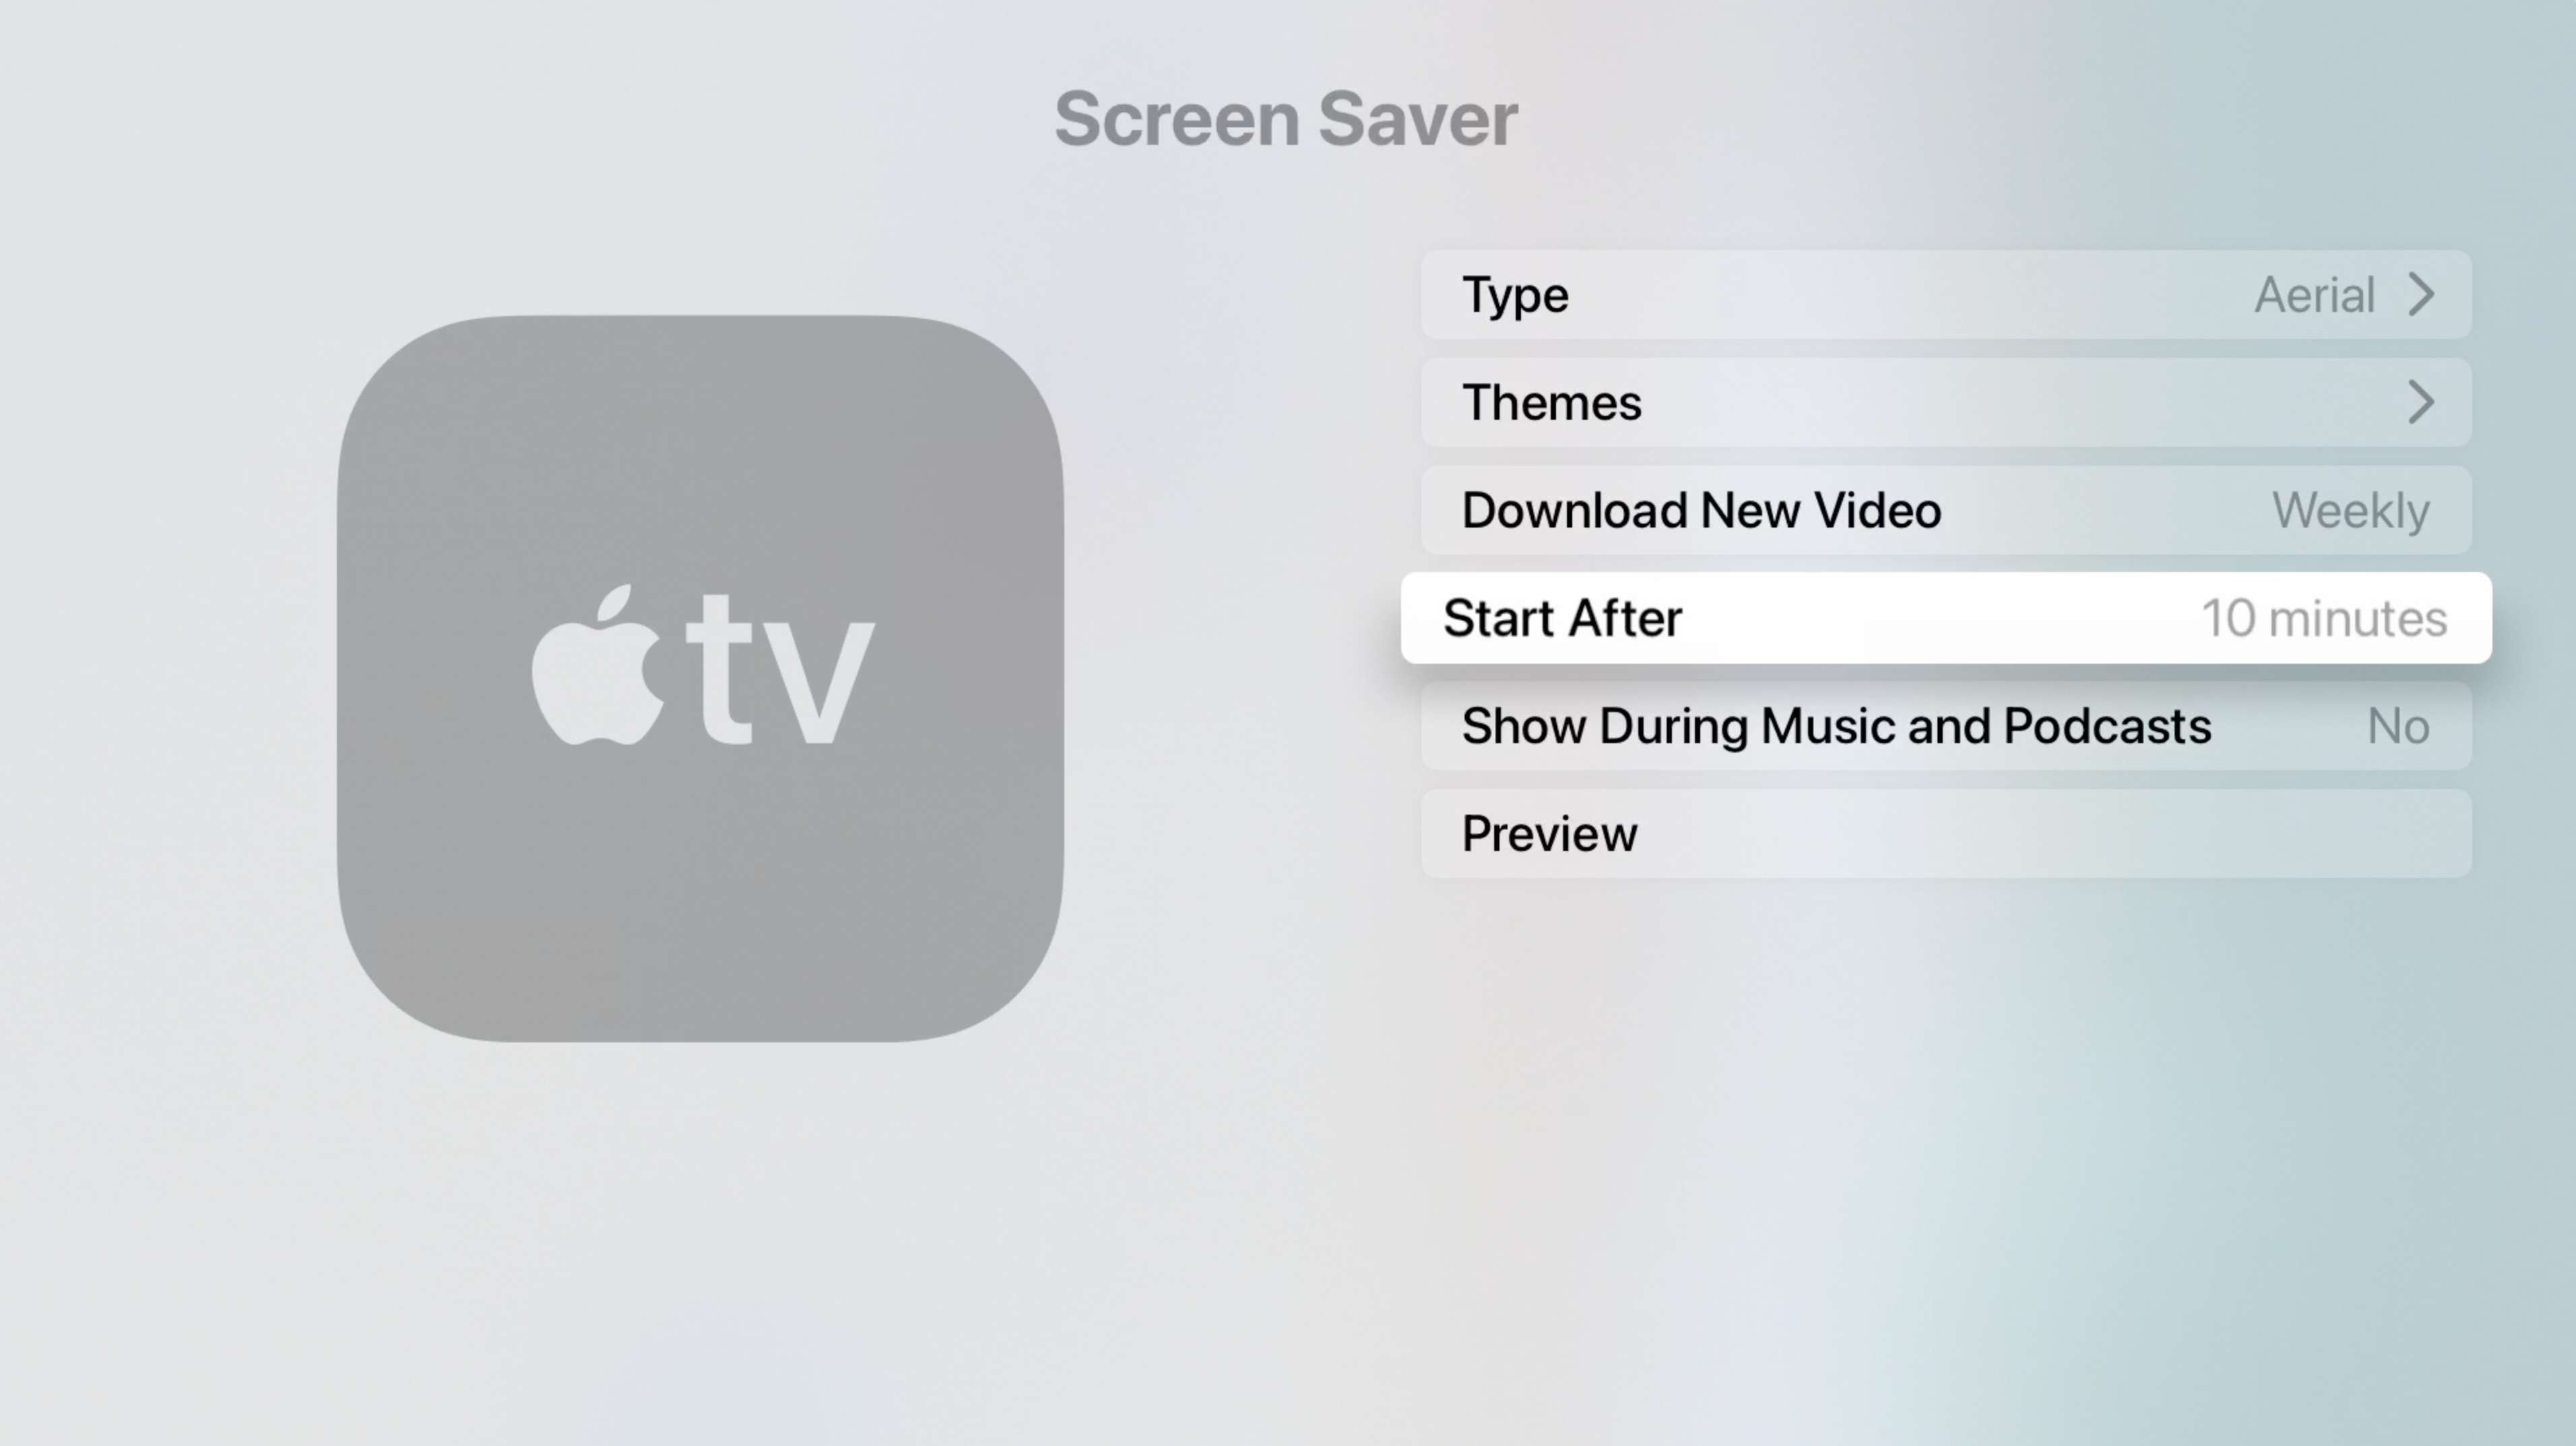 Screen Saver Options on Apple TV